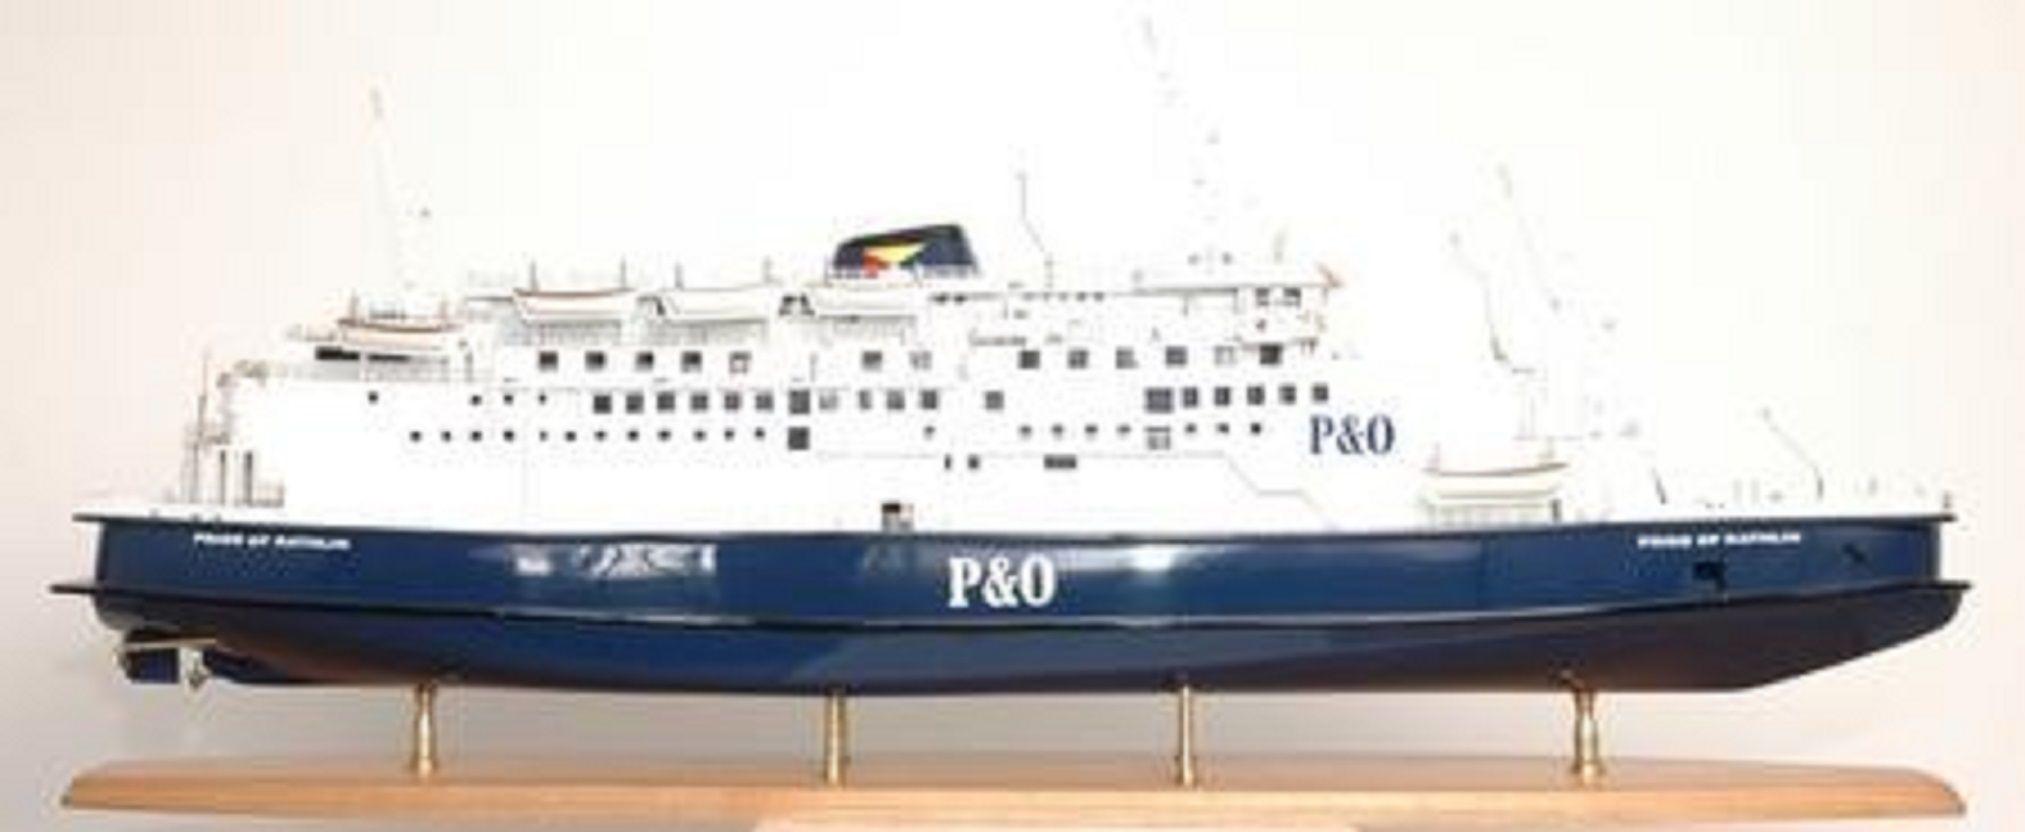 P & O model ships - Pride Aisla and Rathlin